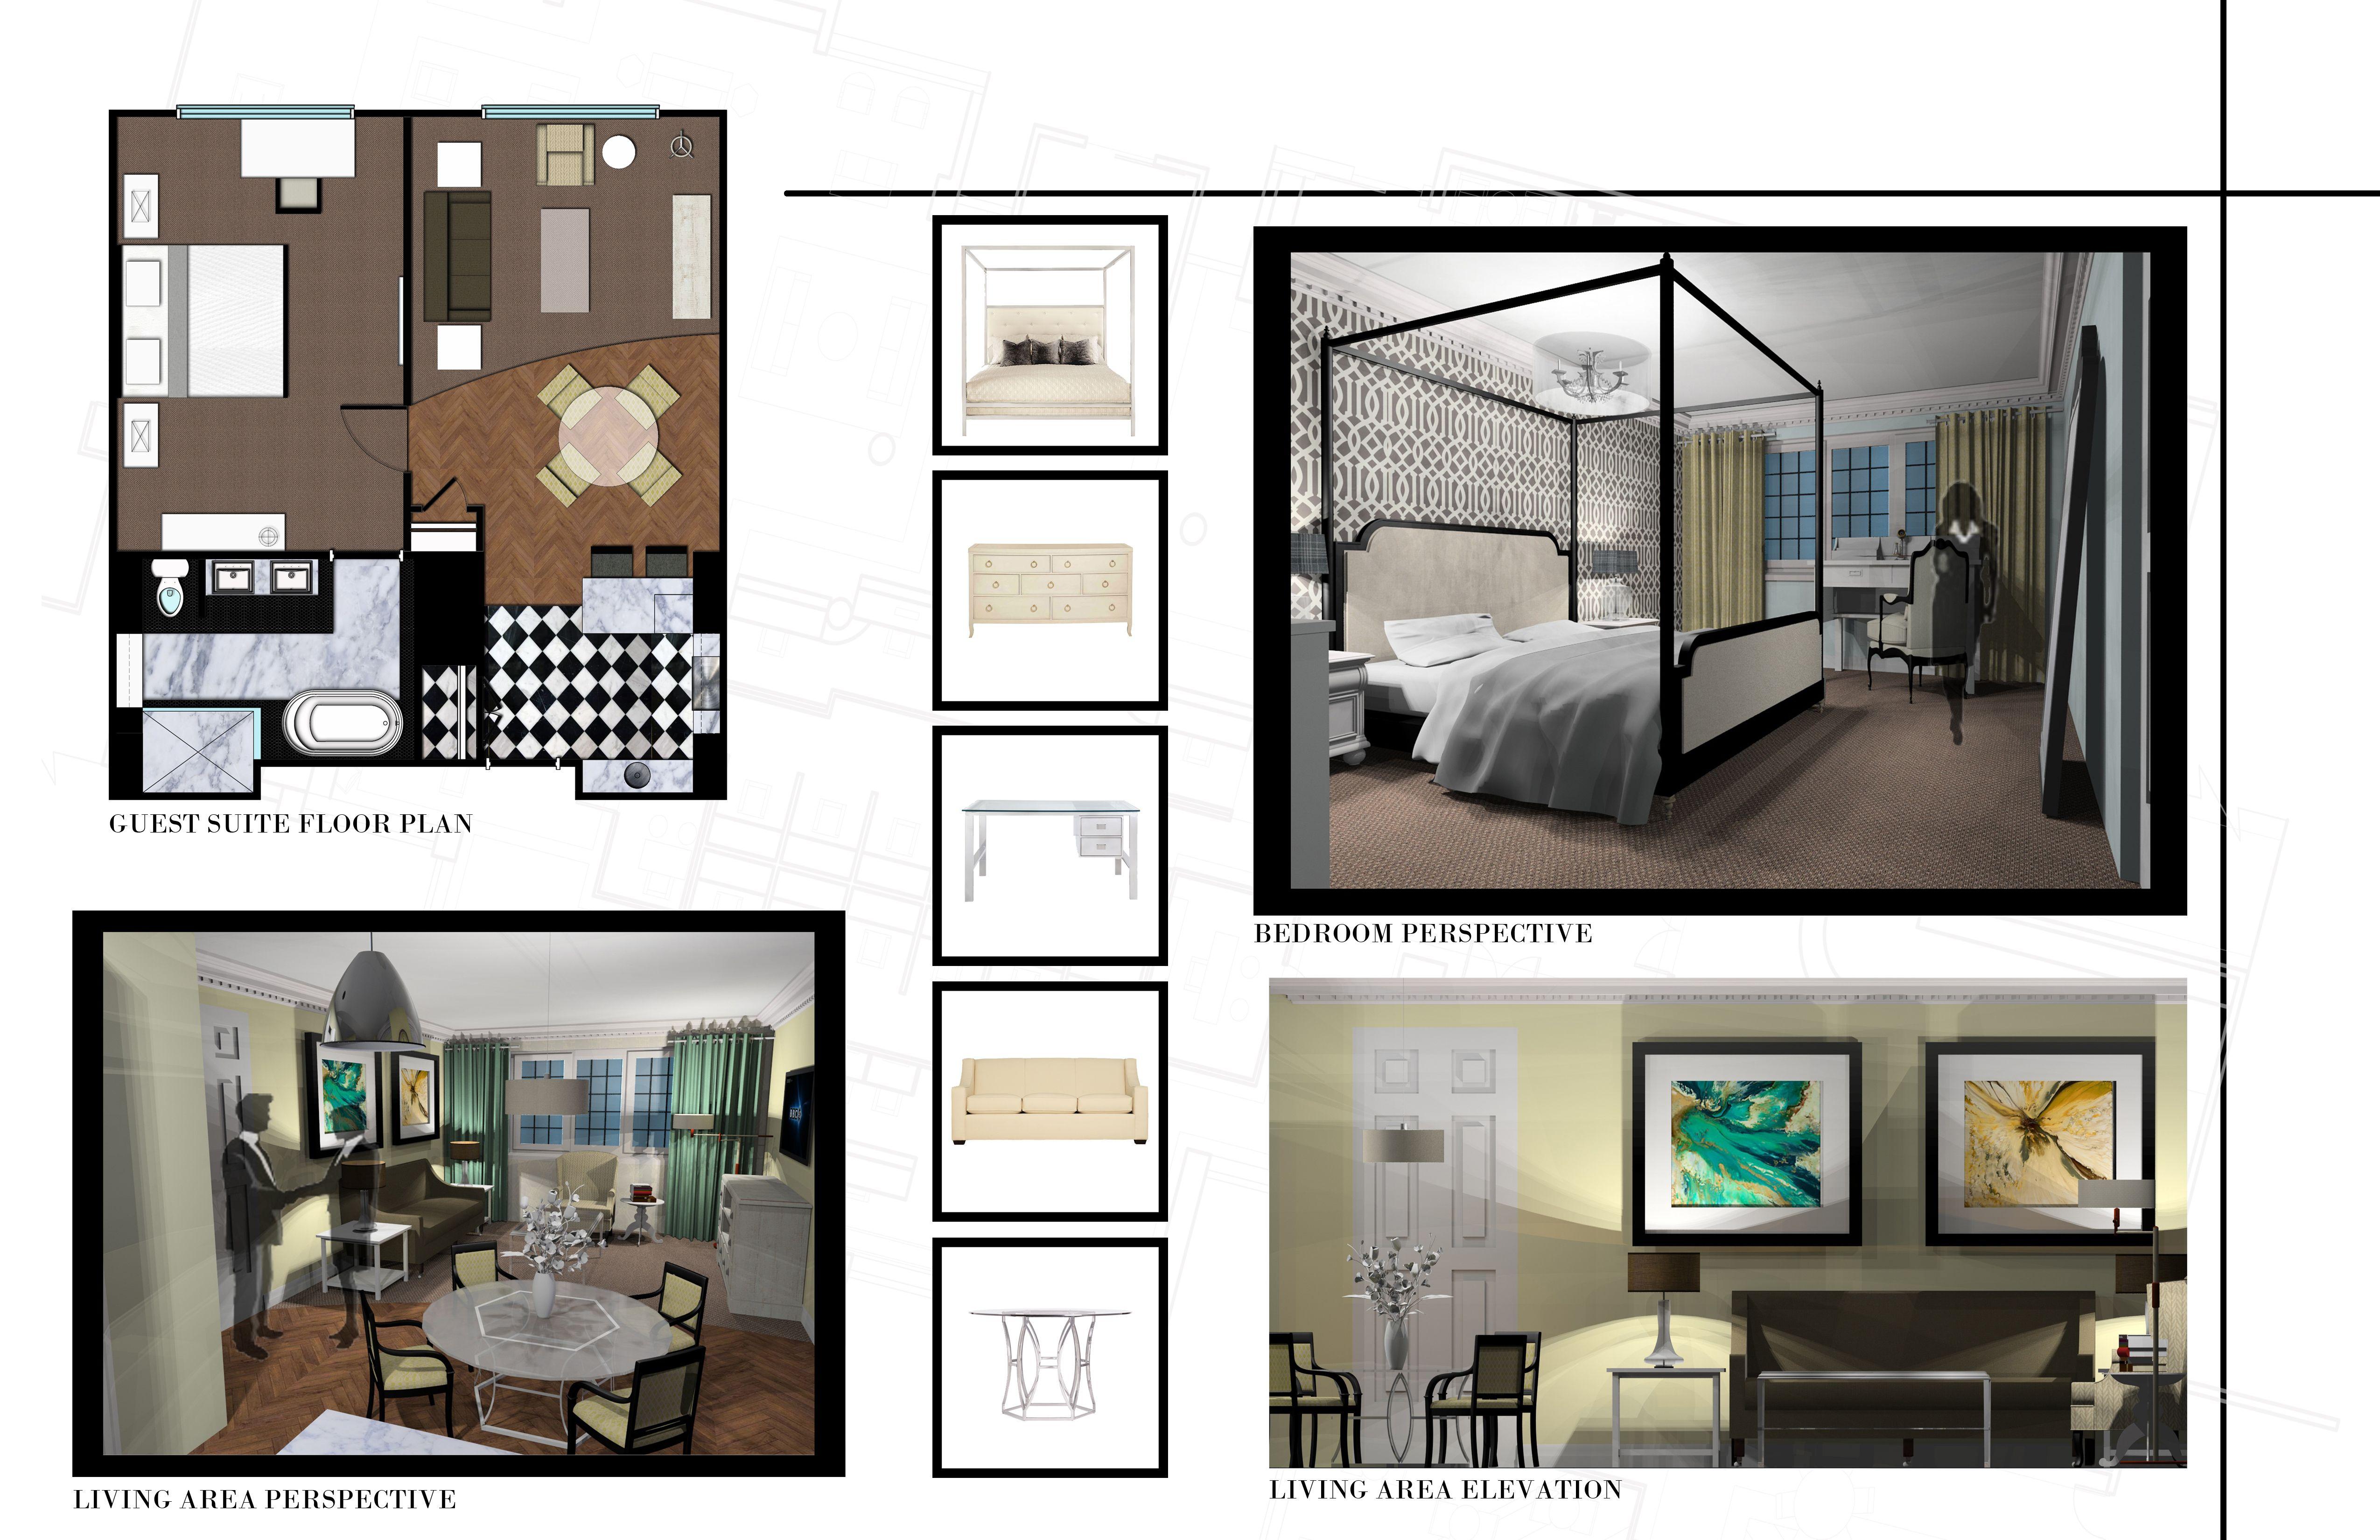 interior design portfolio examples - Google Search ...